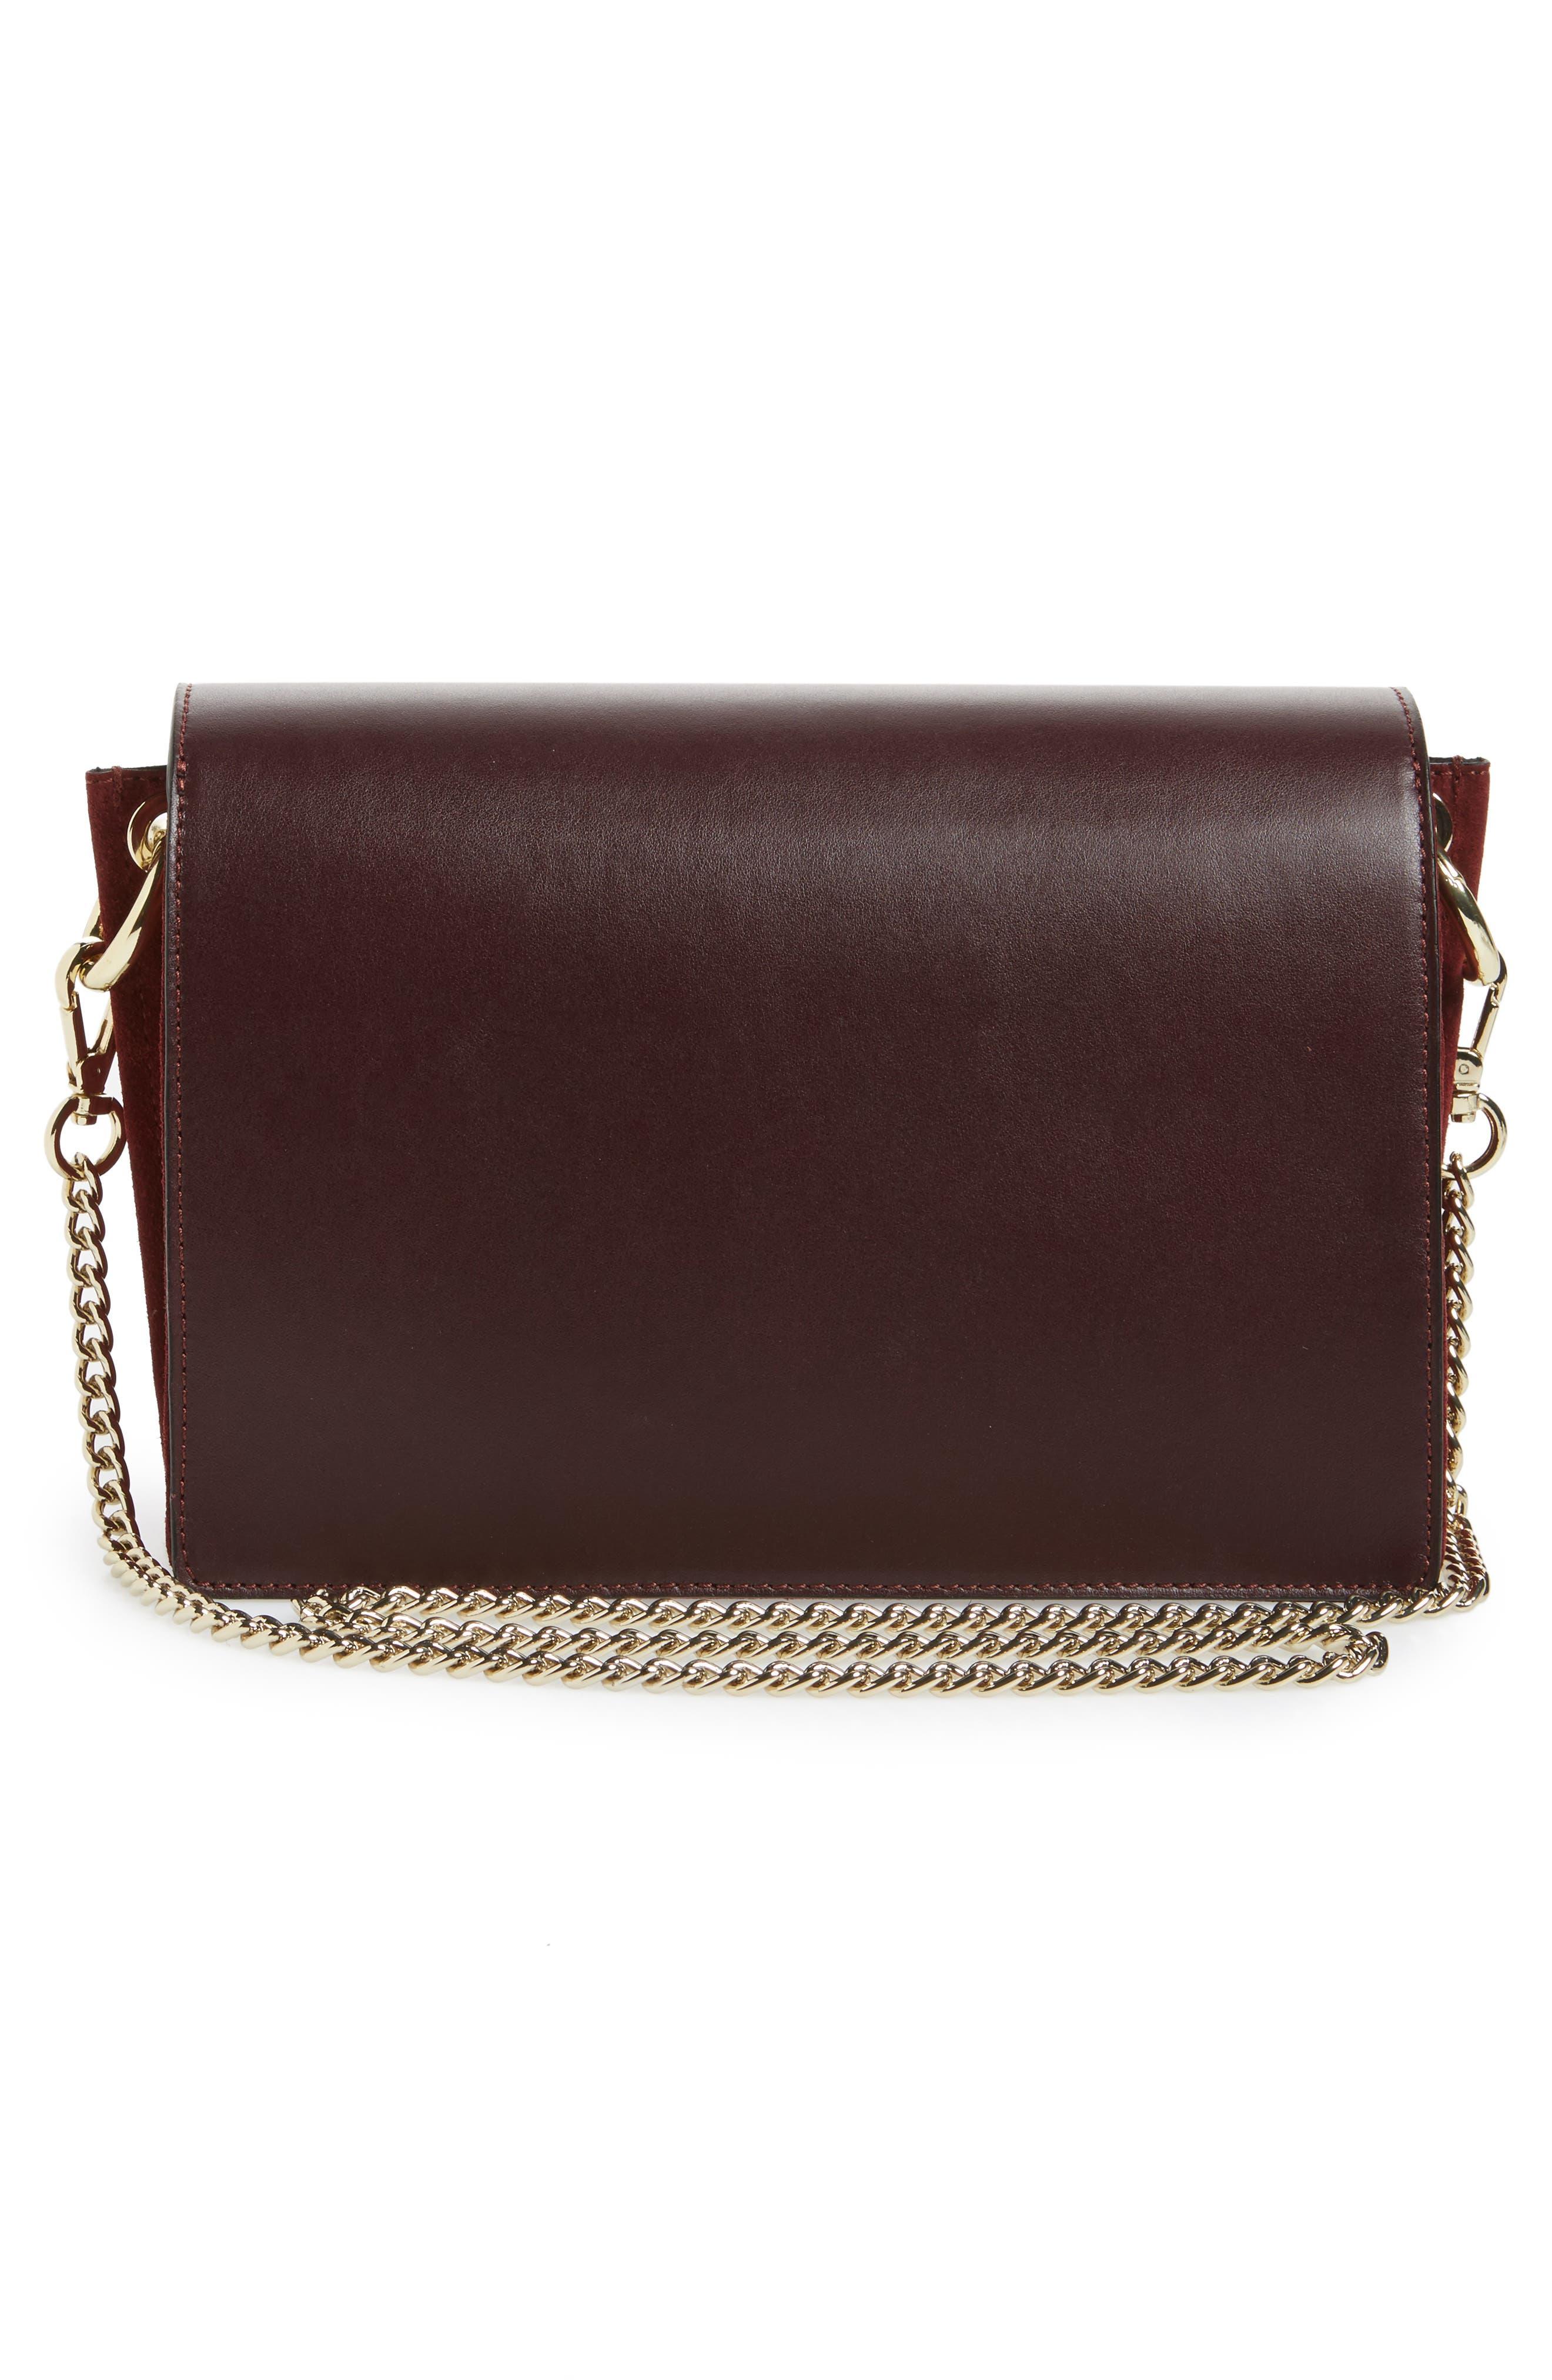 Premium Leather & Suede Soko Shoulder Bag,                             Alternate thumbnail 3, color,                             930